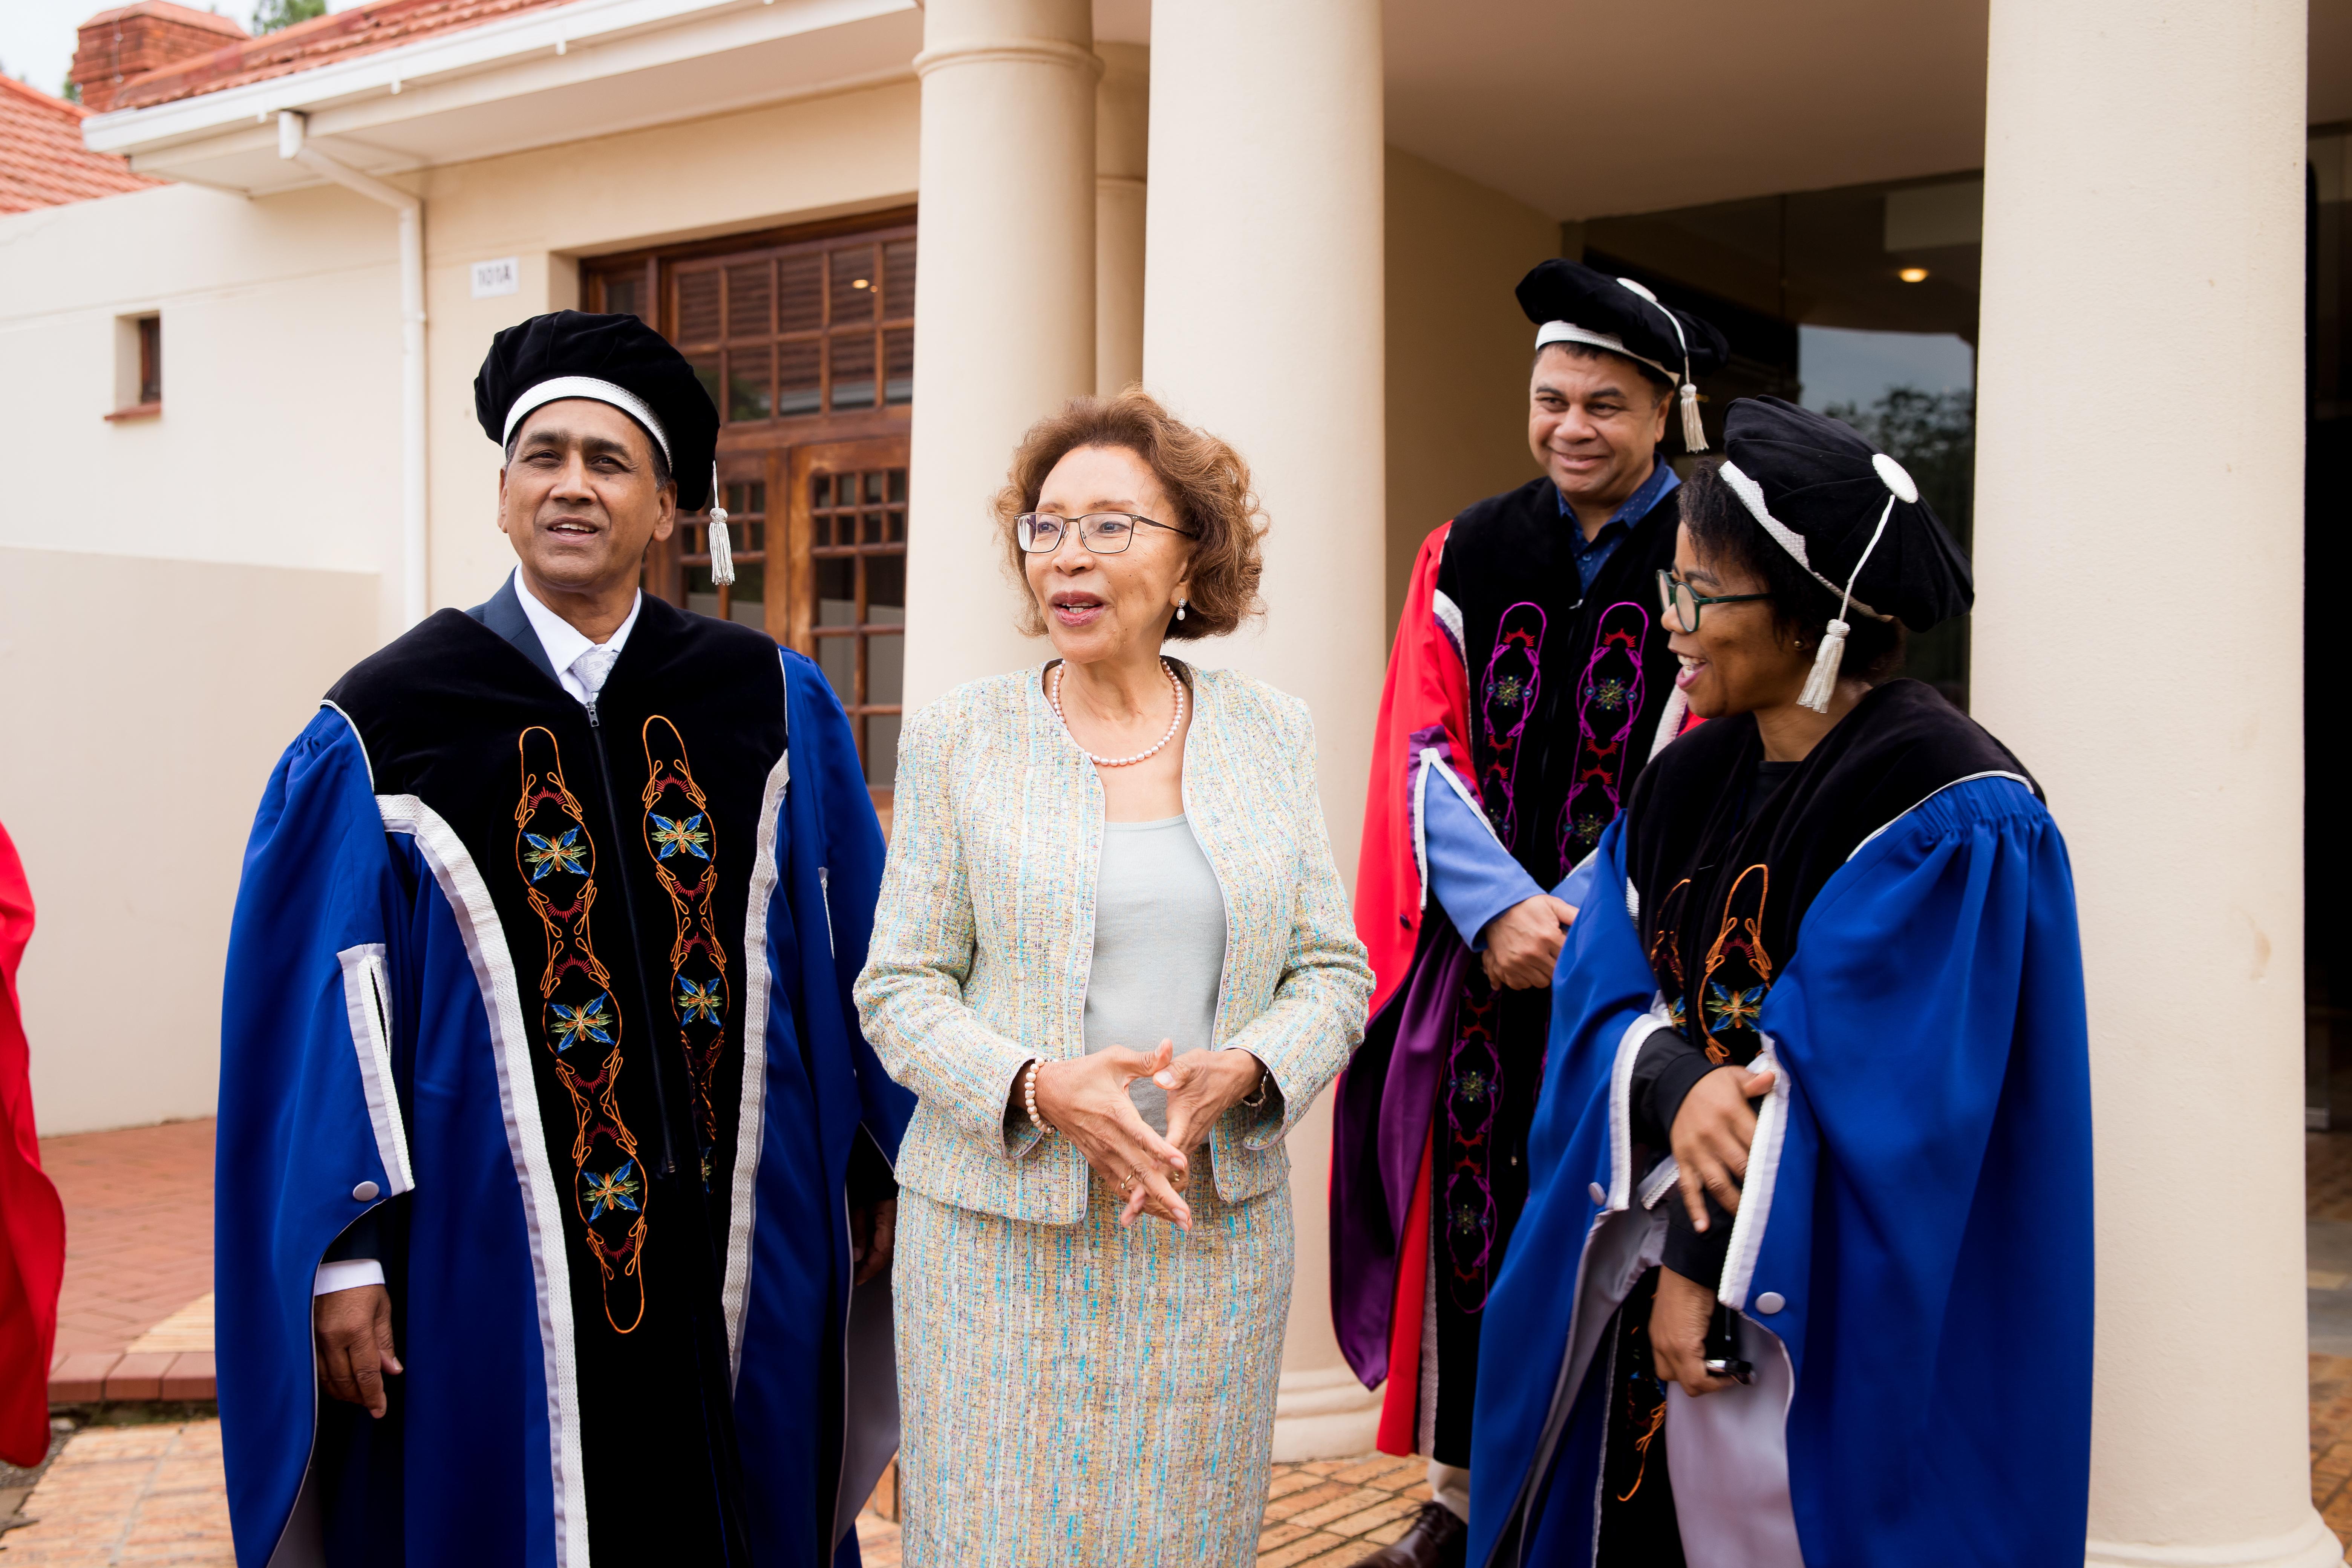 Prof Prakash Naidoo, Dr Tshepo Motsepe, Prof Francis Peteresen, and Prof Puleng LenkaBula